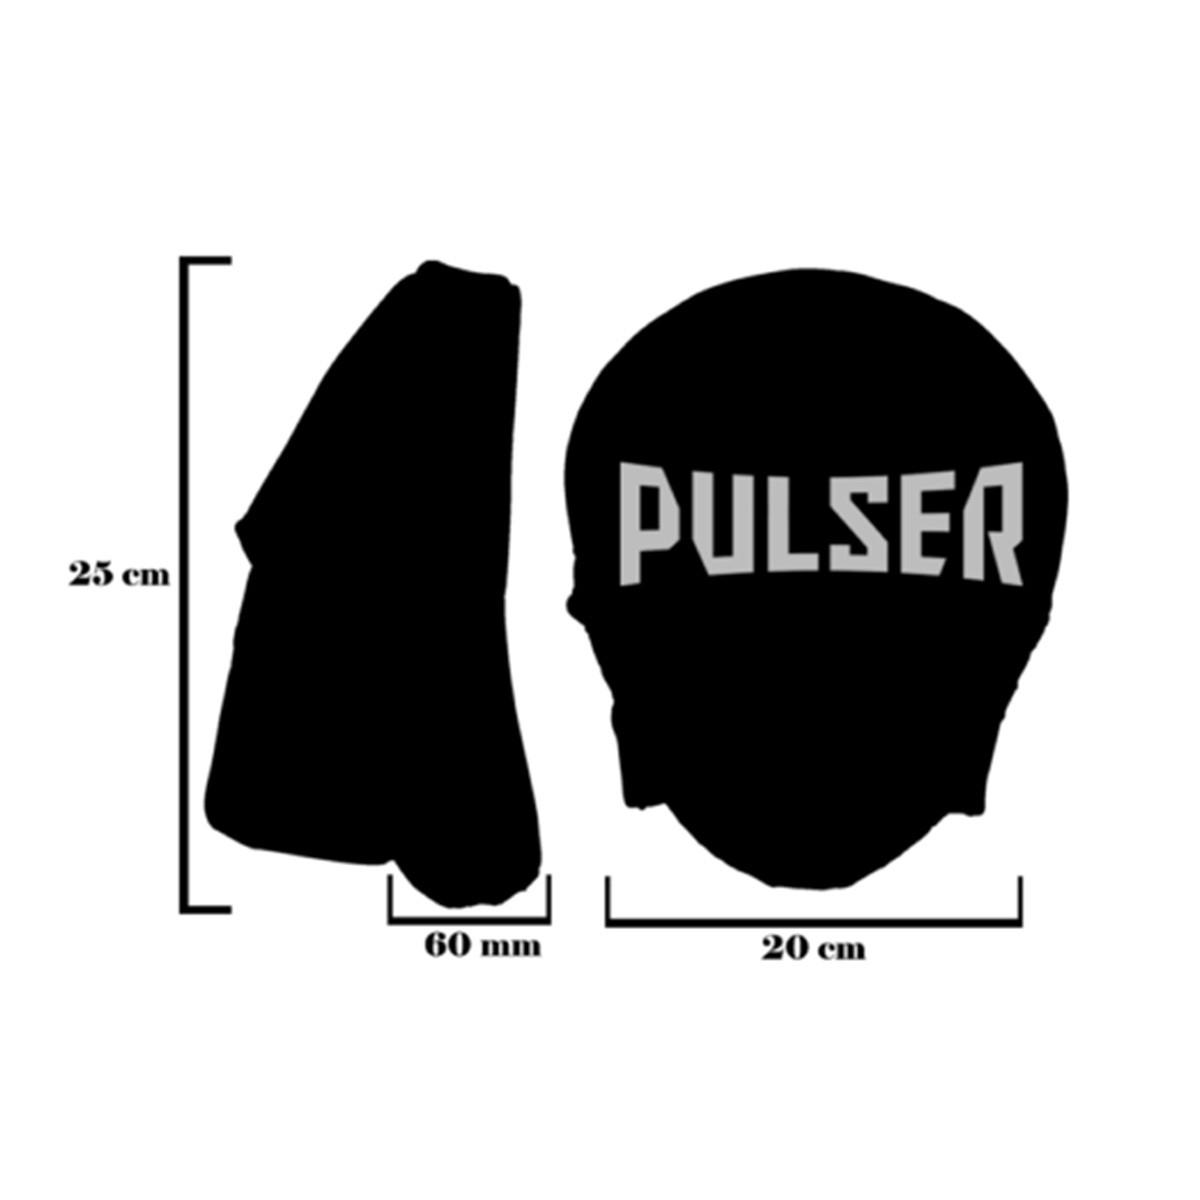 Par Manopla Luva de Foco Tradicional - Pulser  - PRALUTA SHOP